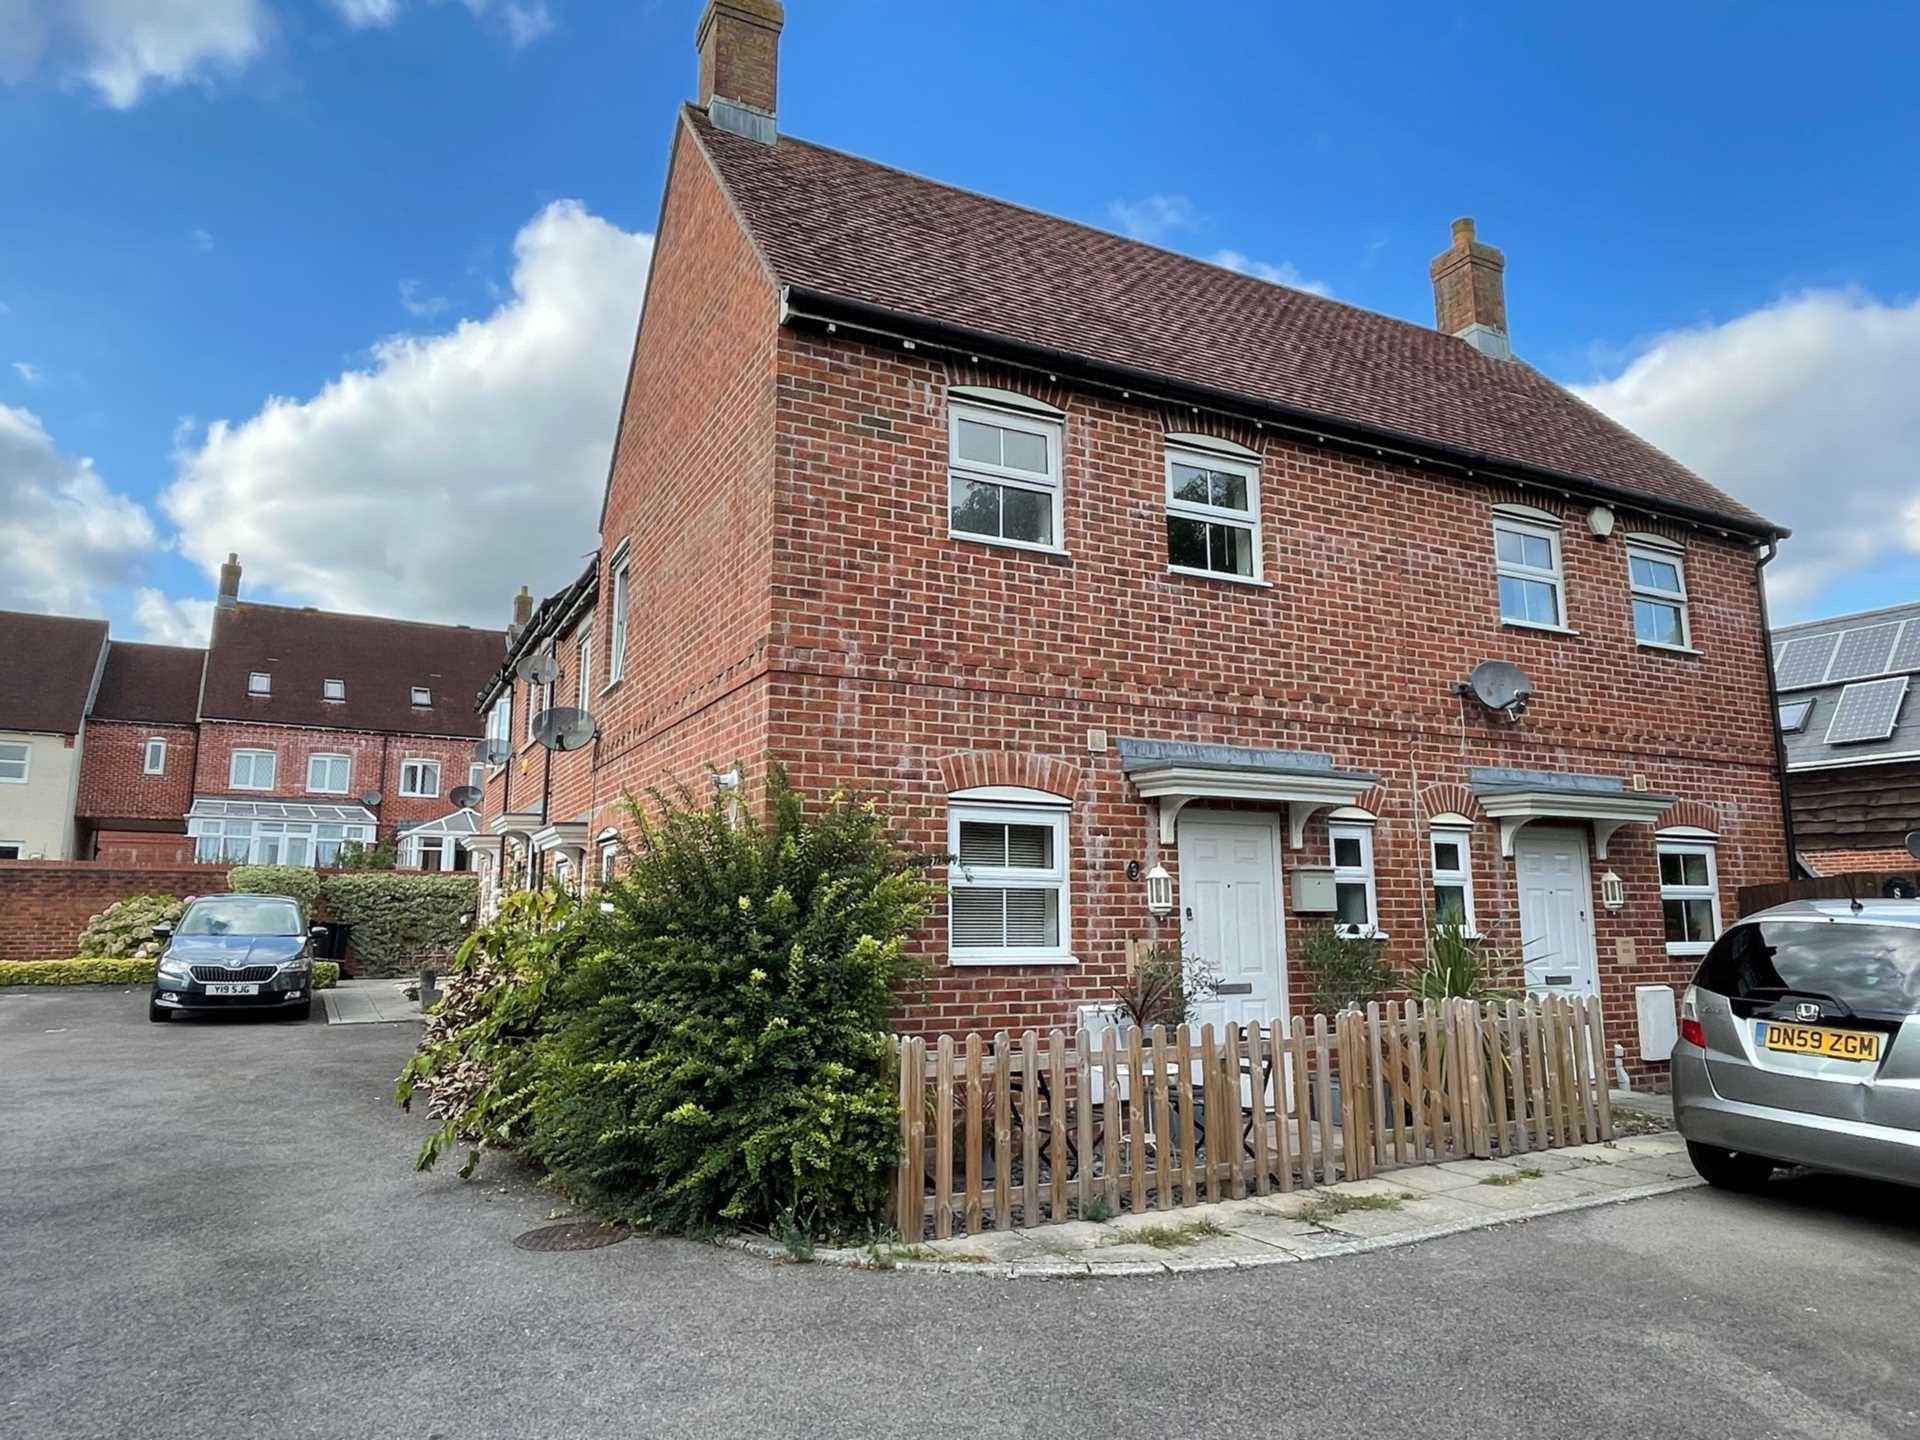 1 bed house to rent in Wyvern Way, Blandford Forum, Blandford Forum 0